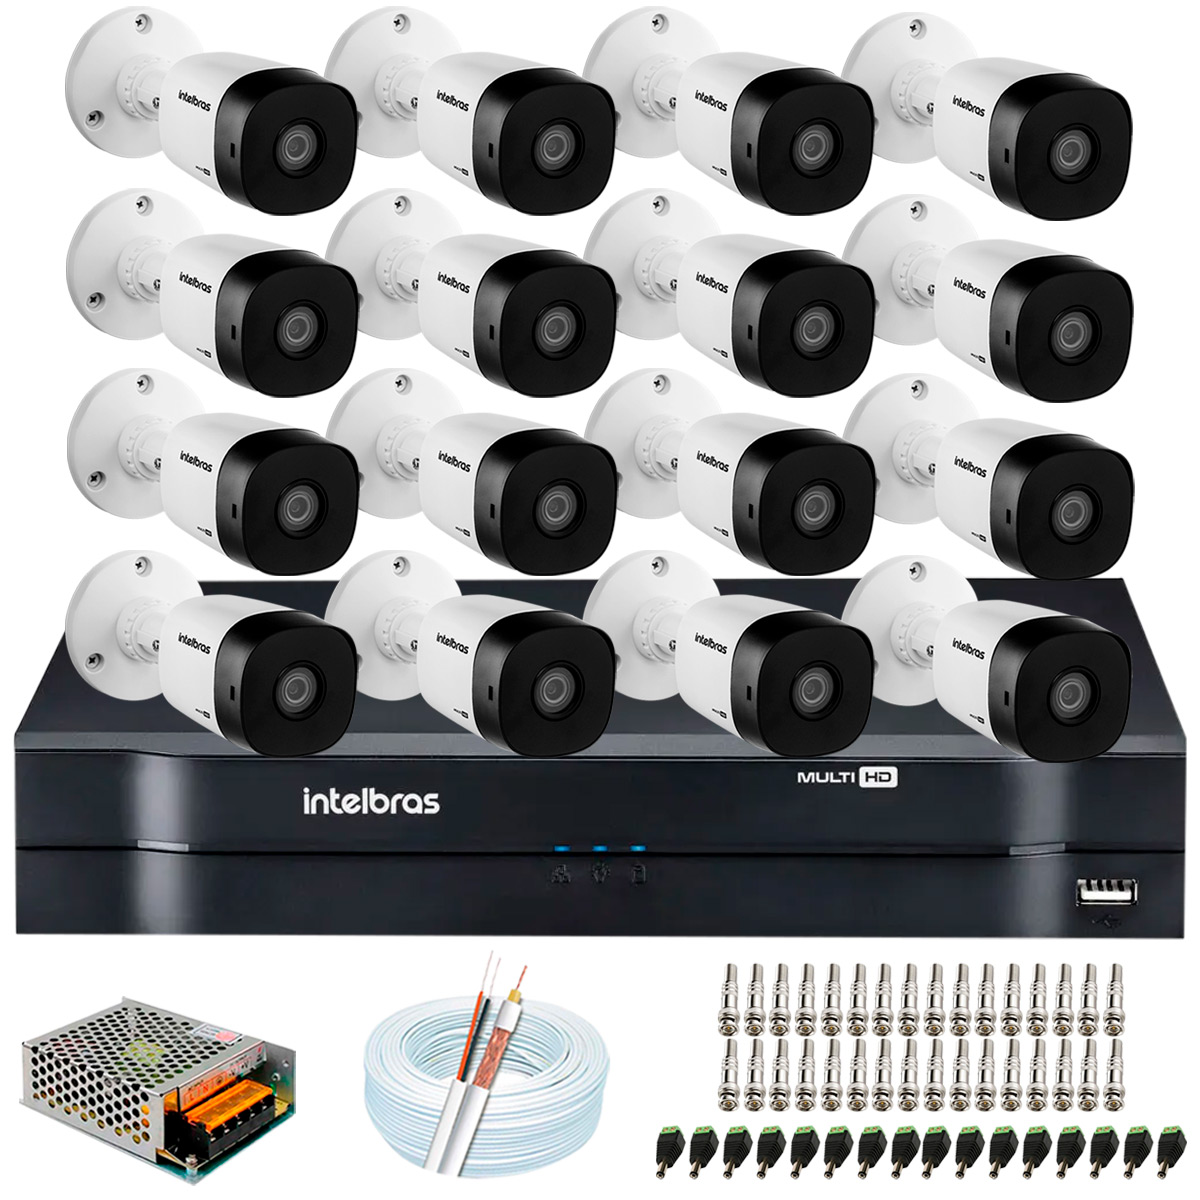 kit-6-cameras-de-seguranca-full-hd-intelbras-vhd-1220-b-g6-dvr-intelbras-full-hd-mhdx-3108-de-8-canais-acessorios